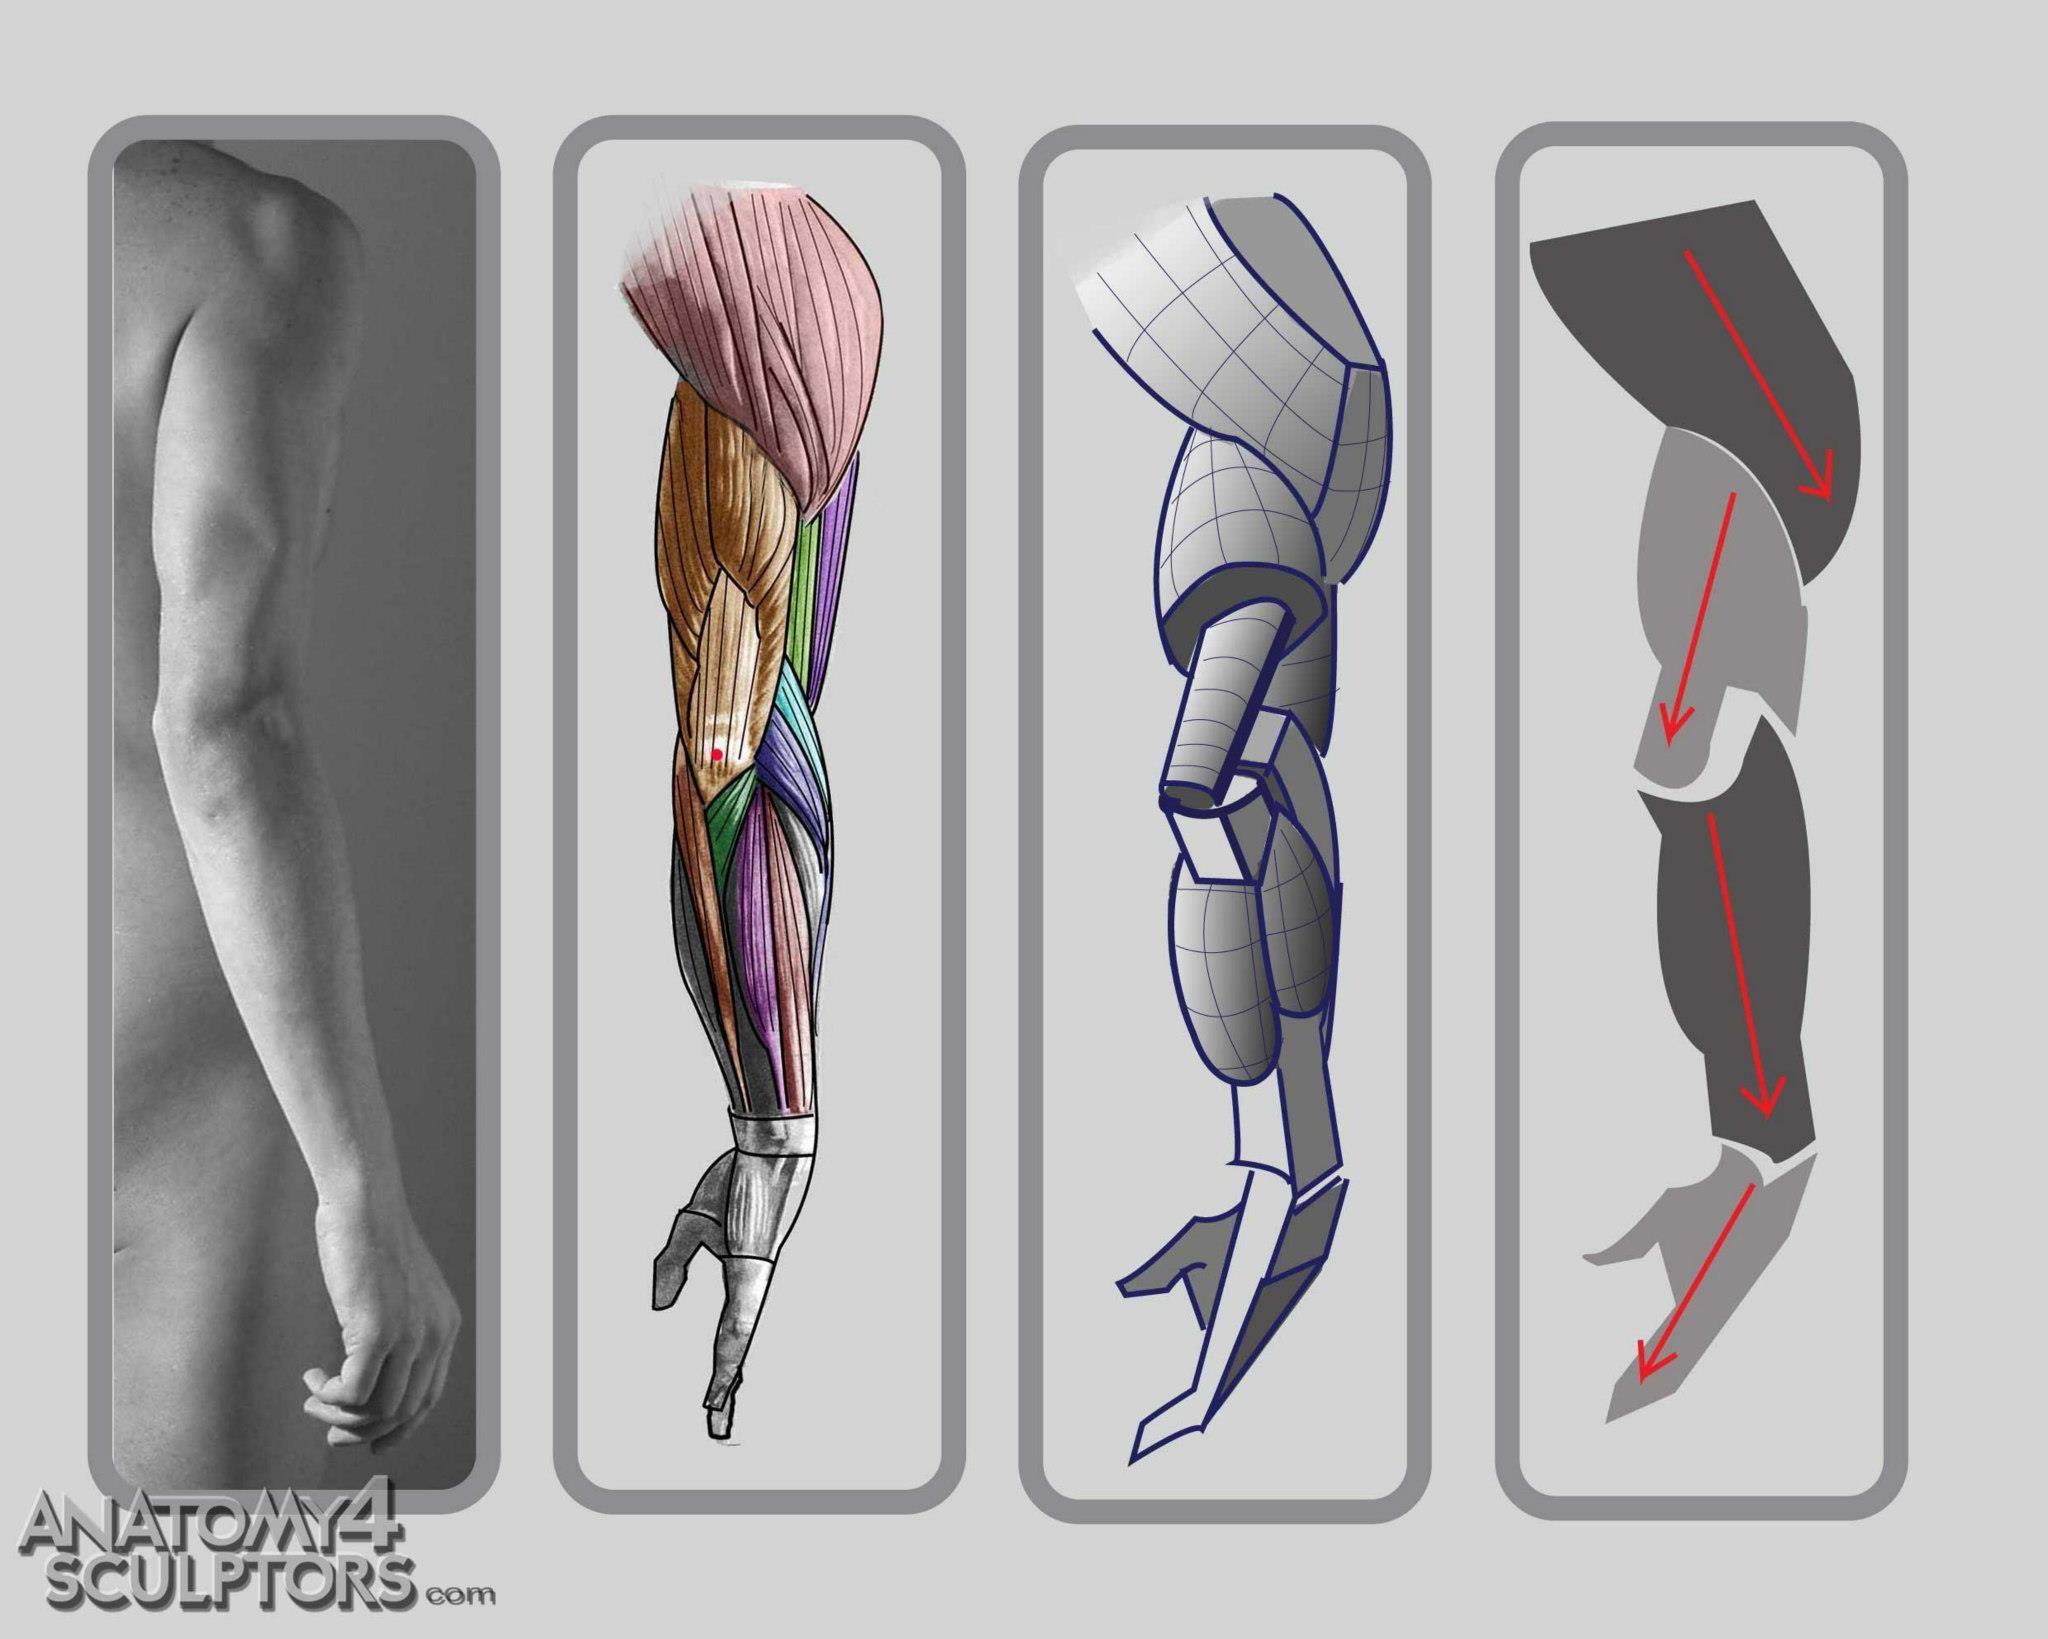 anatomy 4 sculptors | Anatomy | Pinterest | Anatomy, Human anatomy ...